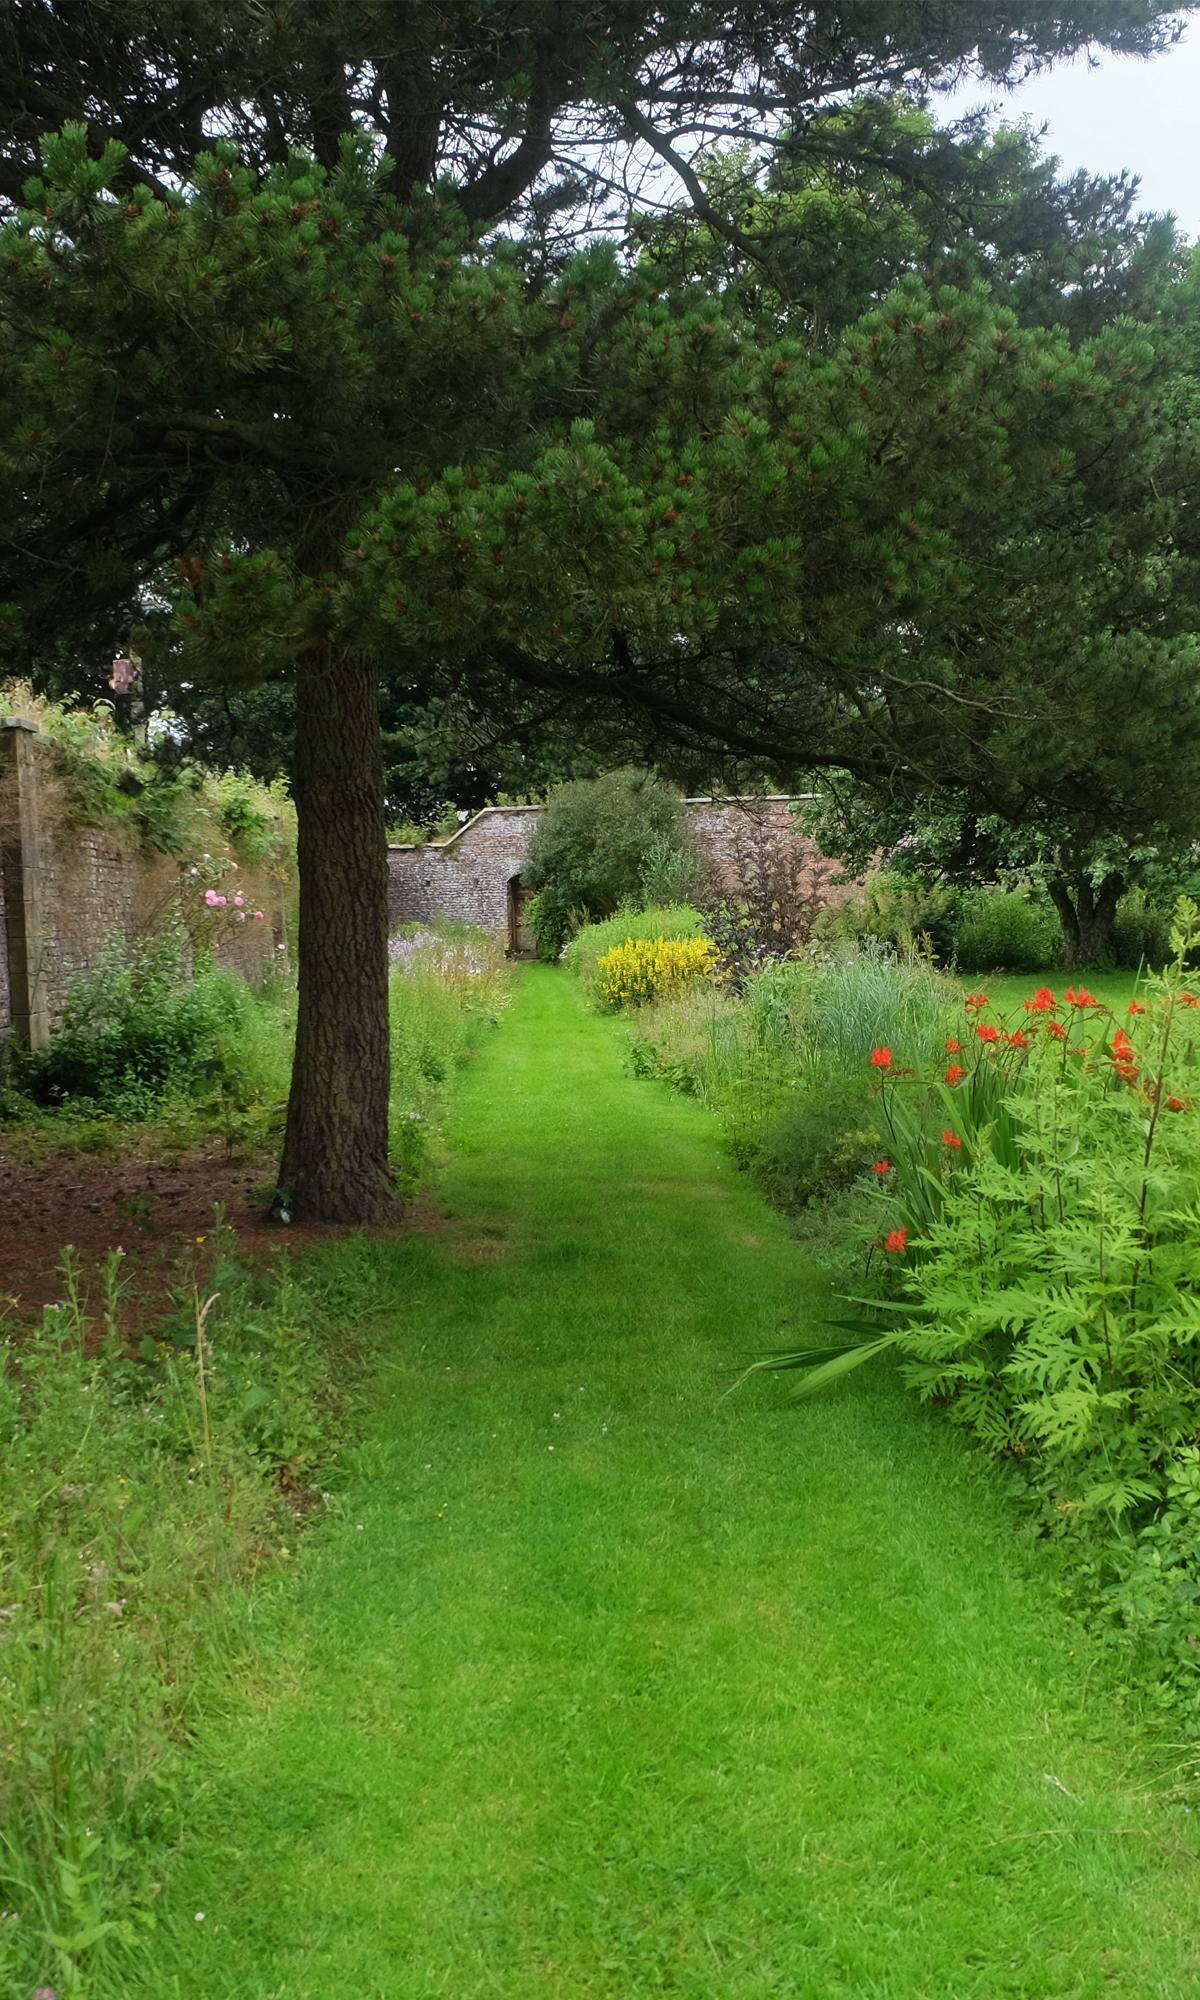 hesleyside wallled garden 1